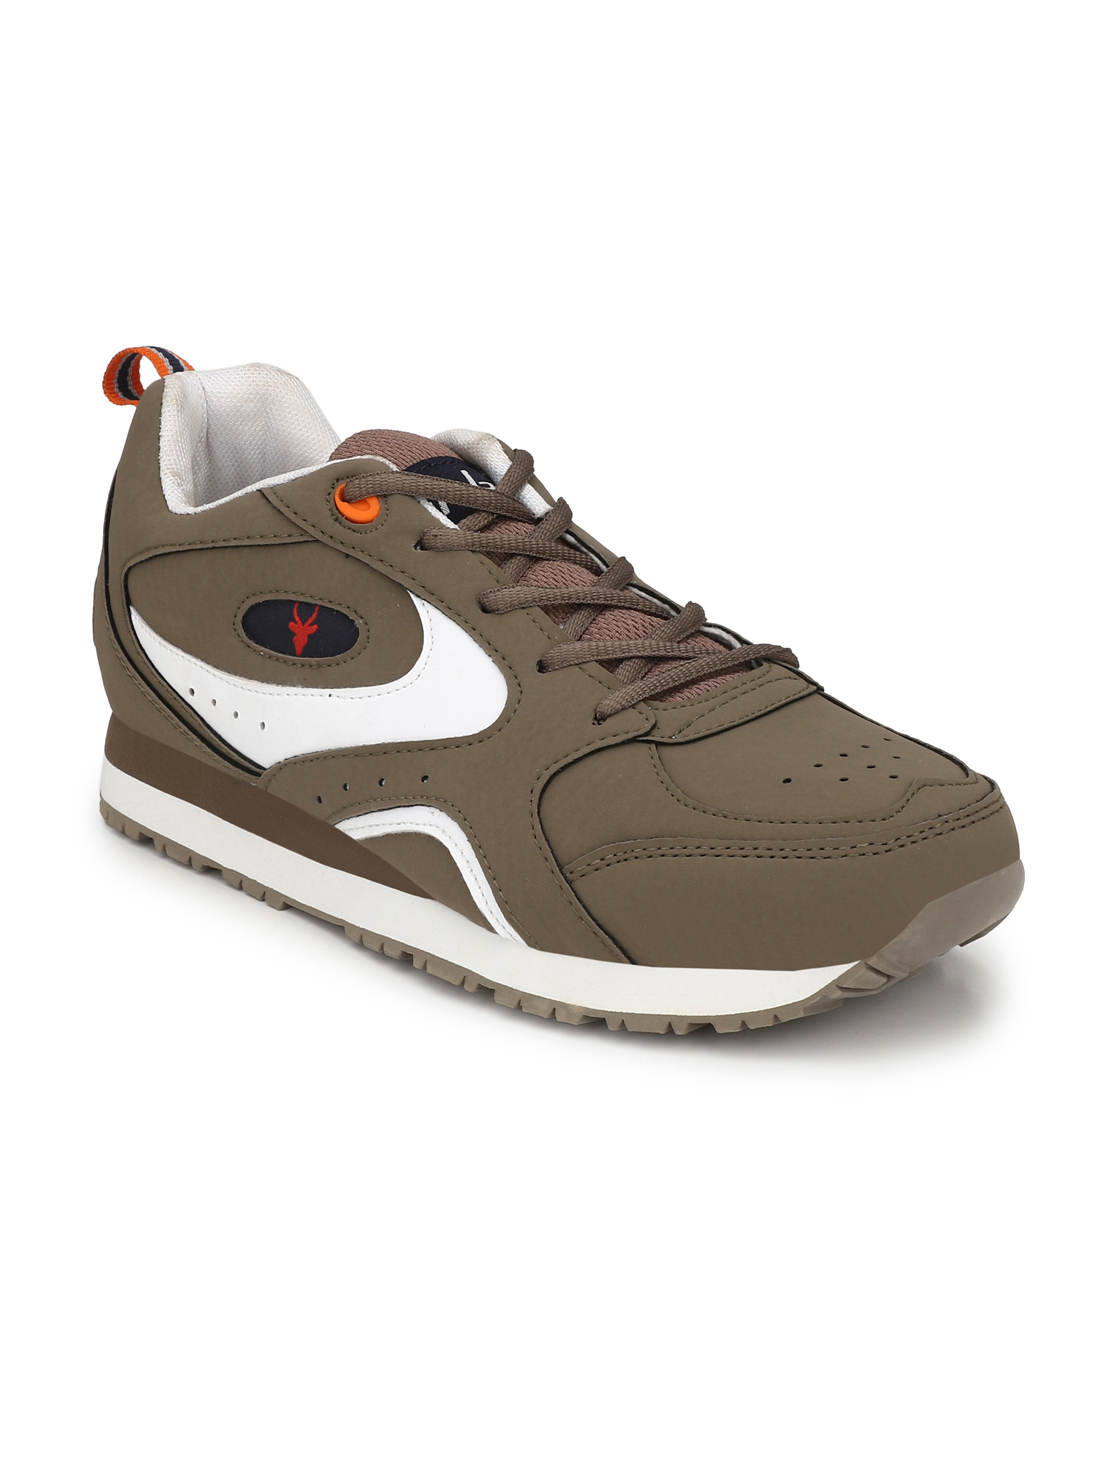 Hirolas | Hirolas Men's Multisport Sneaker Shoes- Chickoo